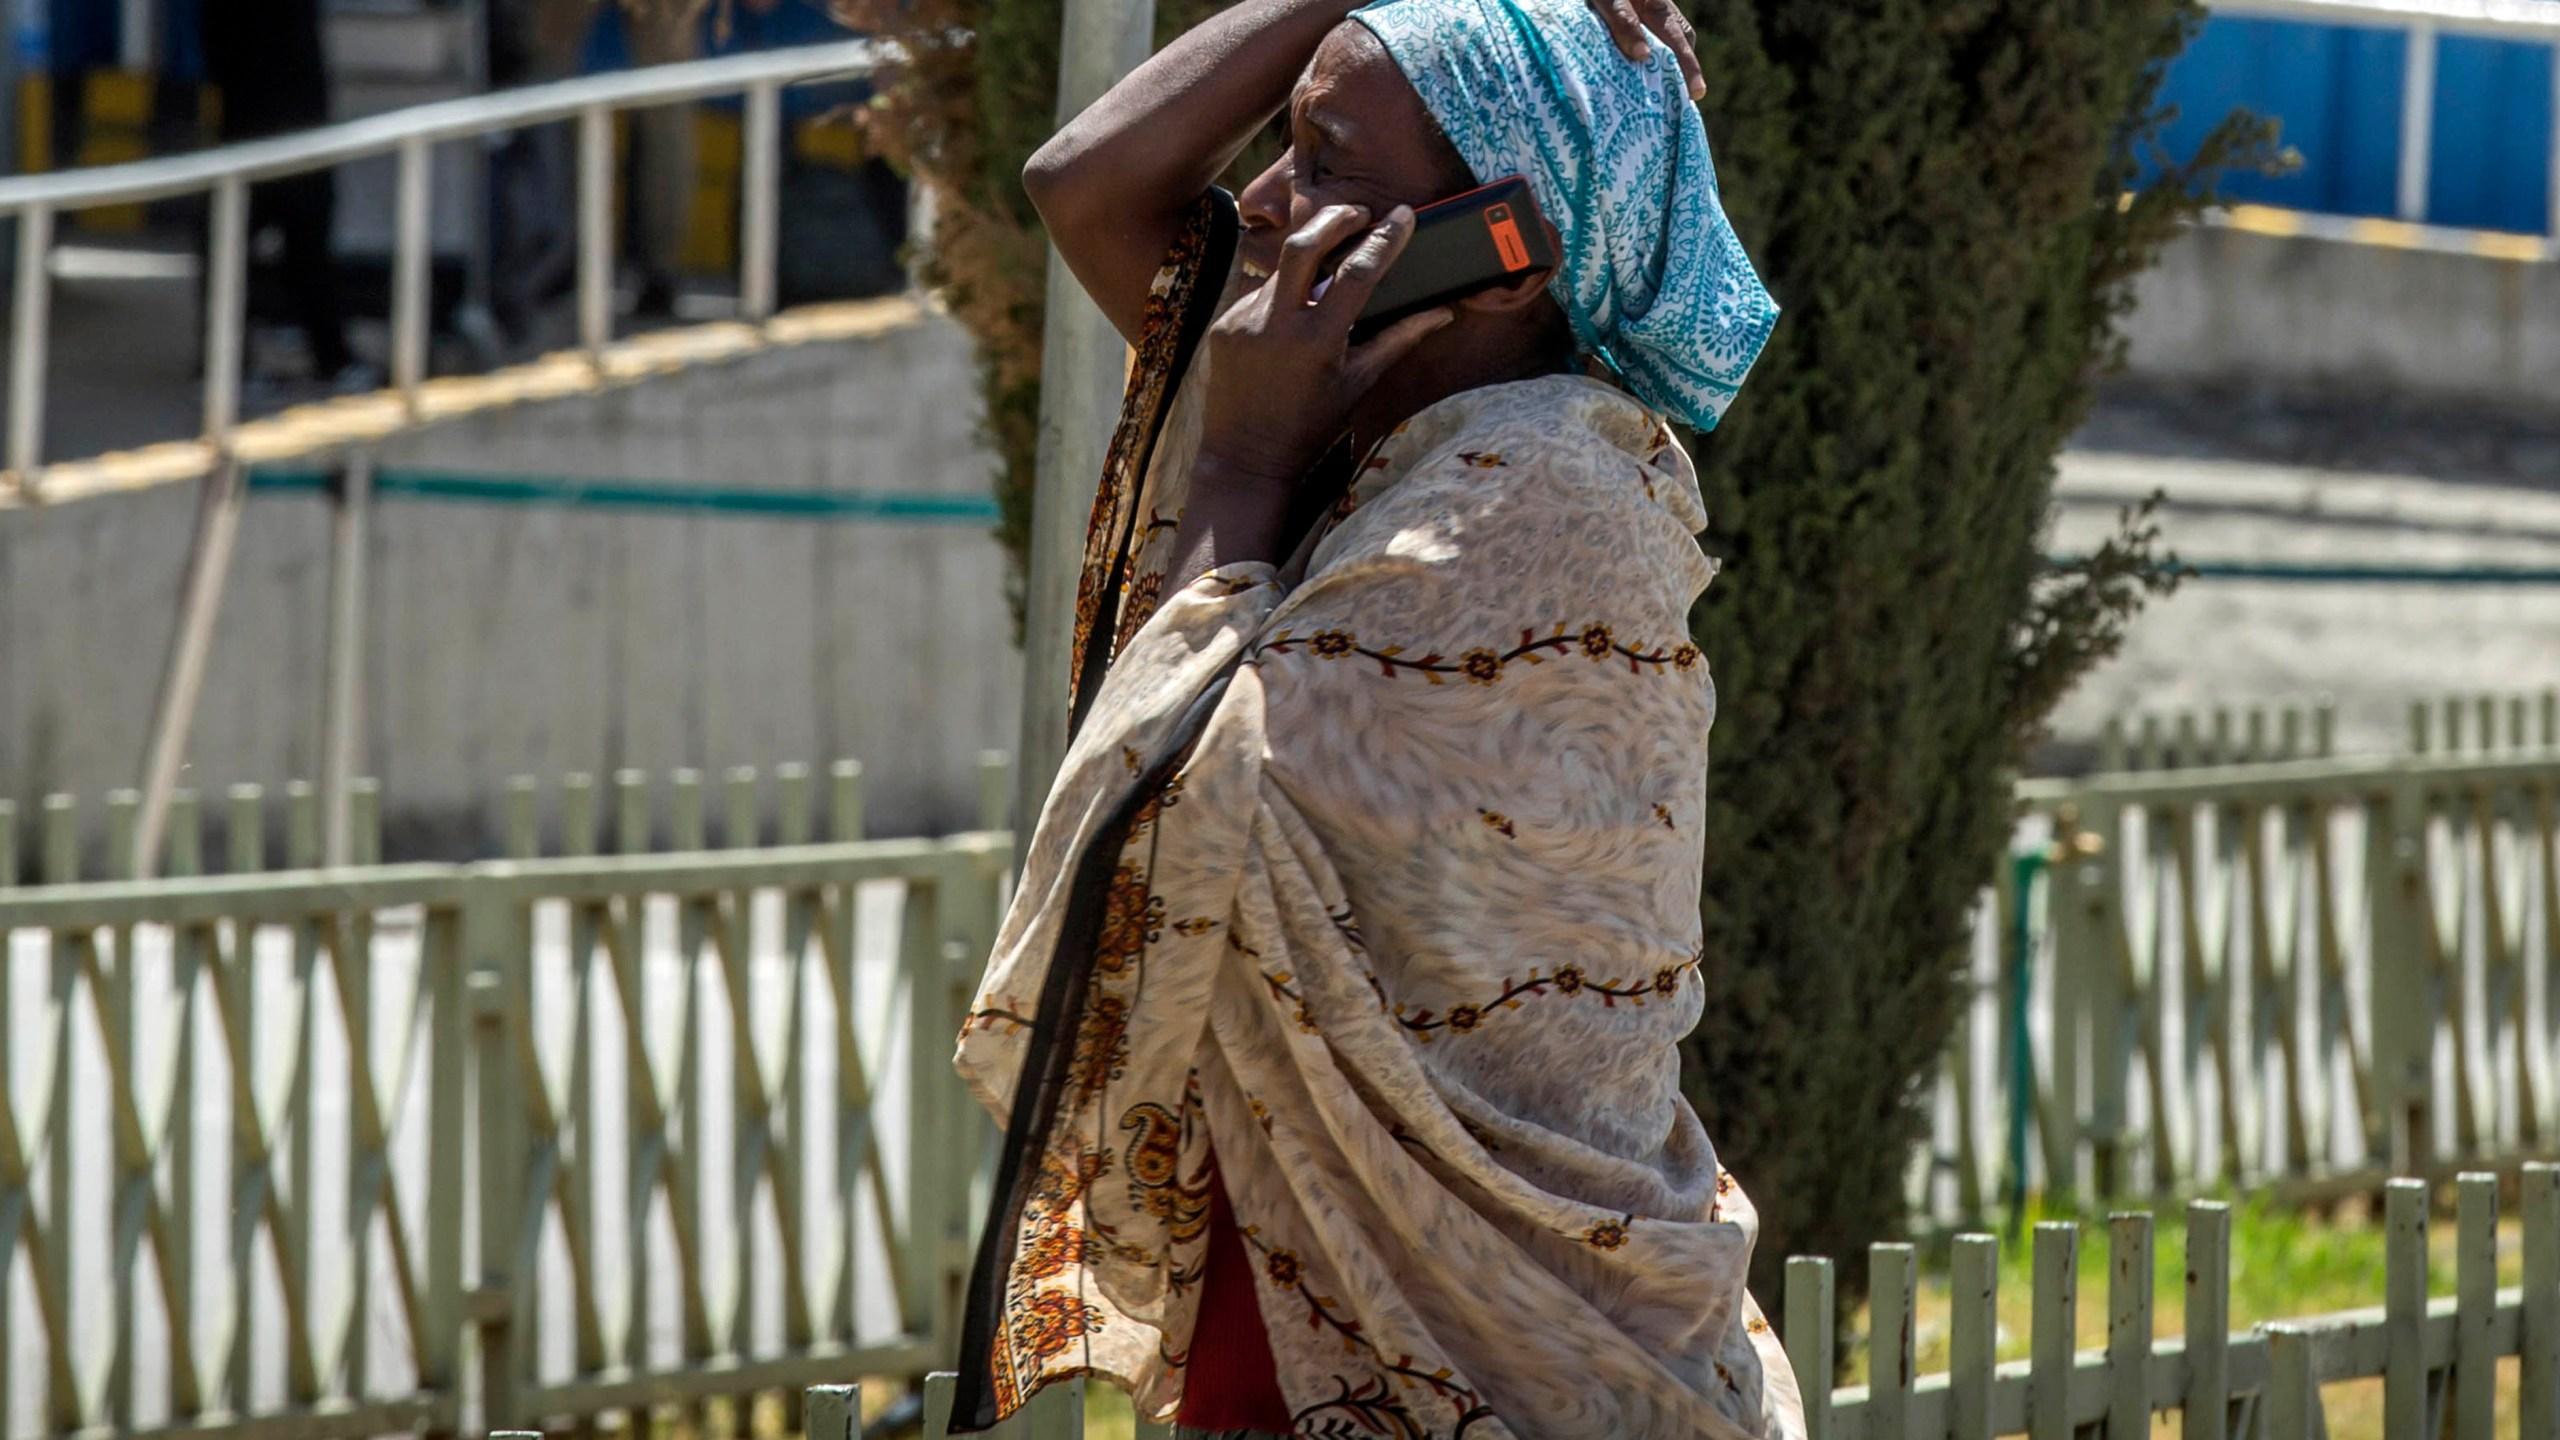 Ethiopia_Plane_Crash_82257-159532.jpg92743517